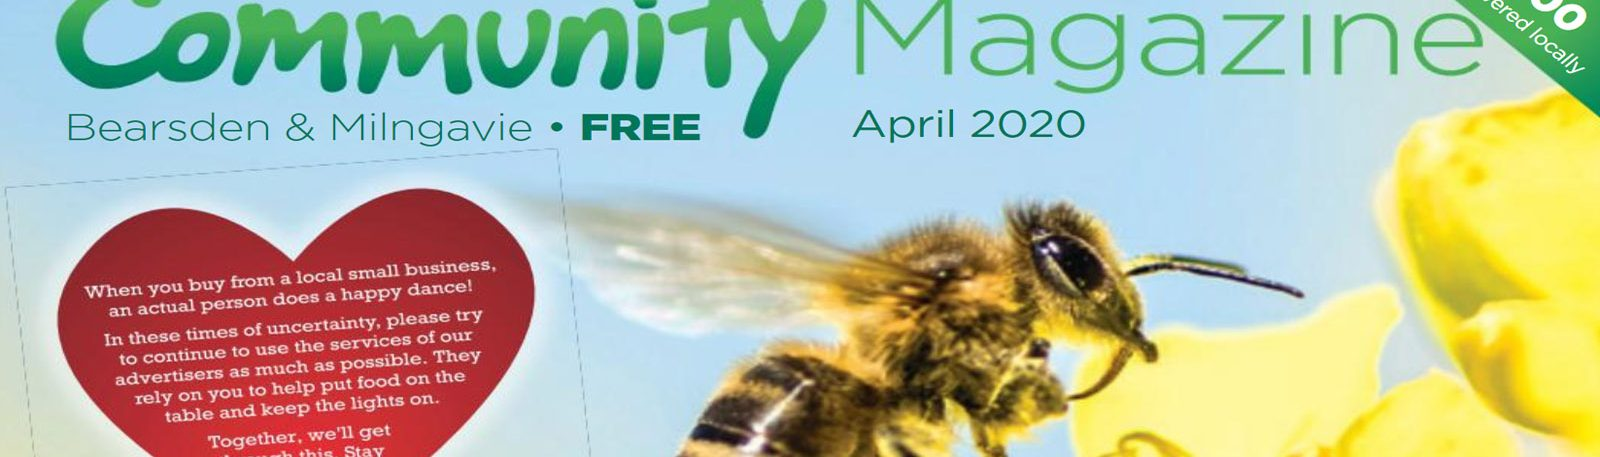 Community Magazine April 2020